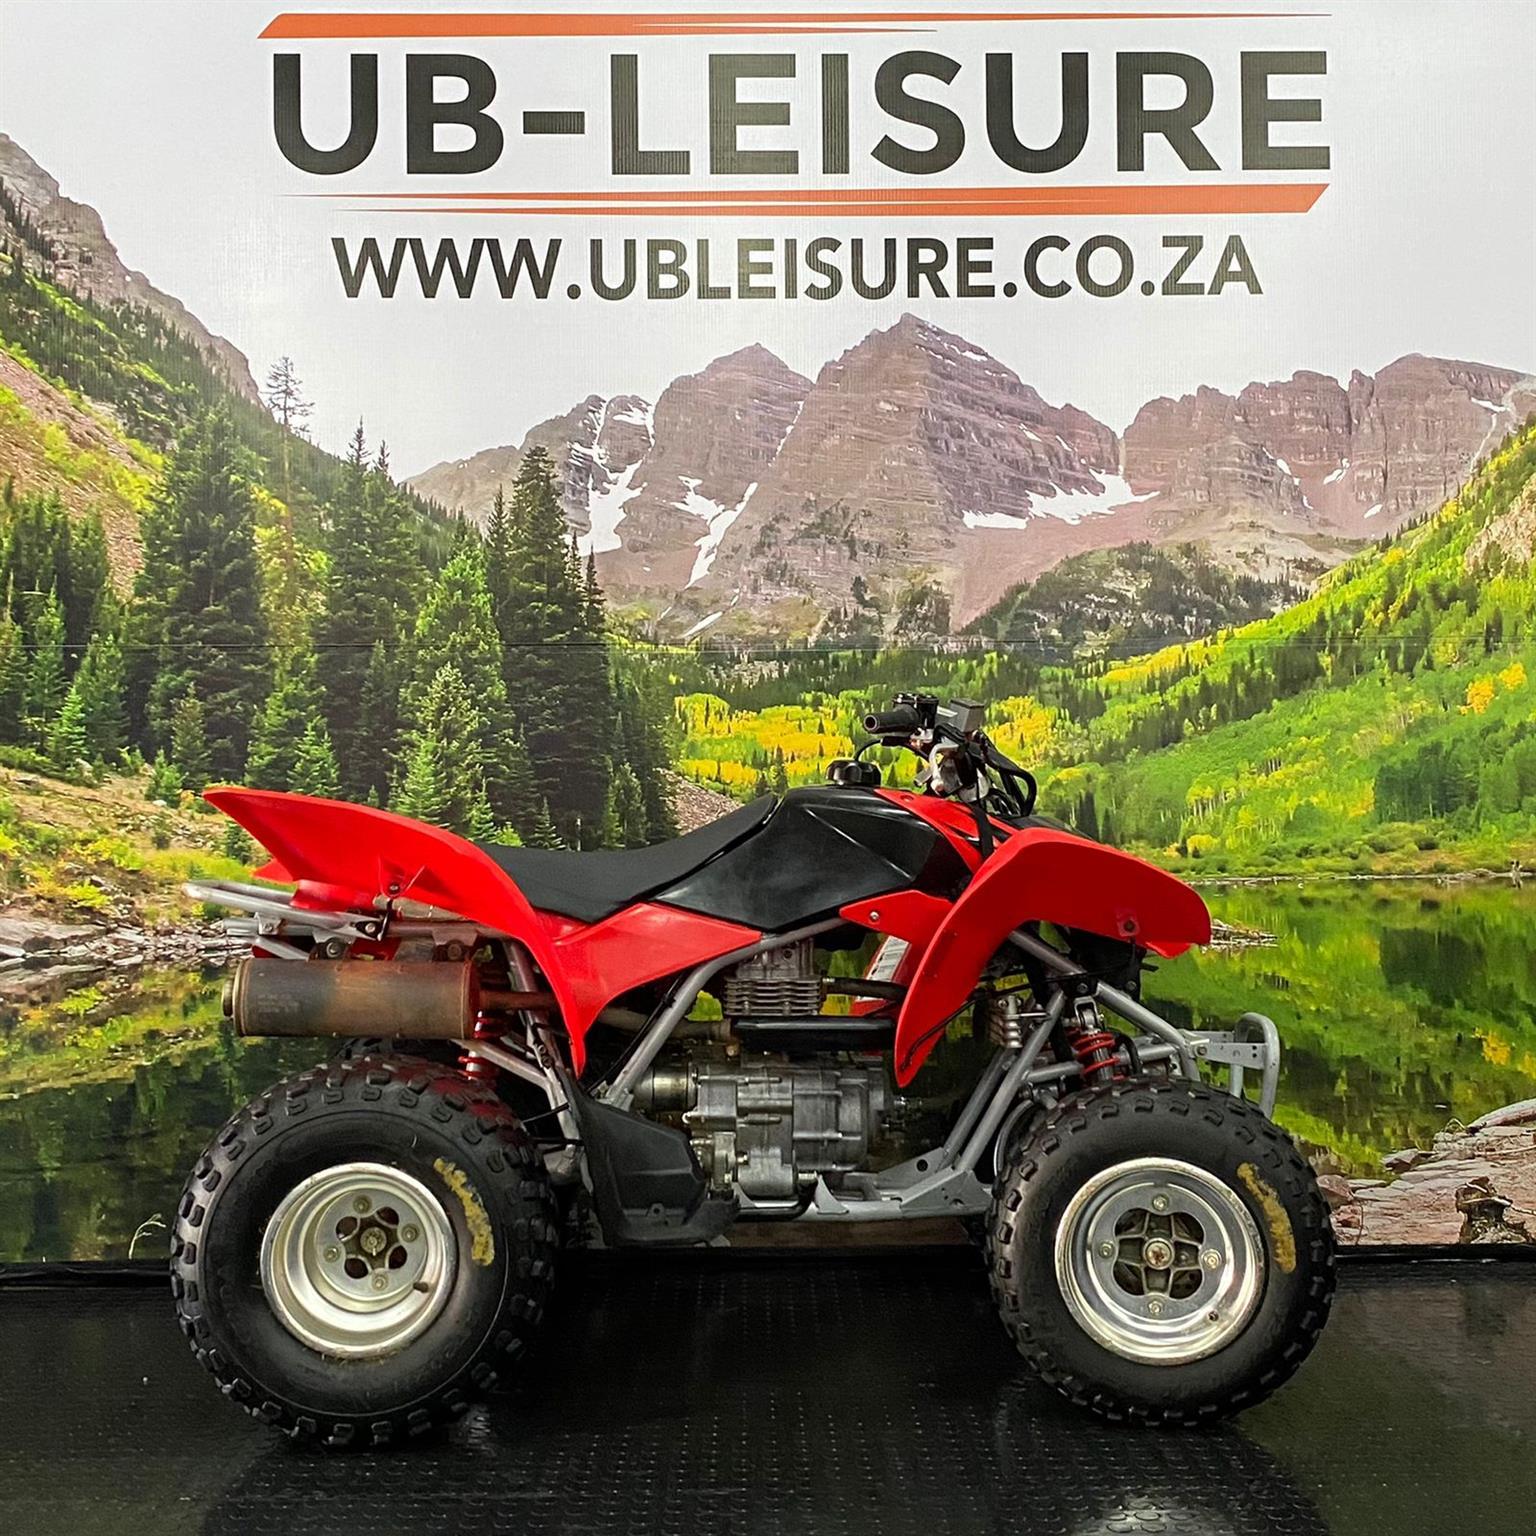 2006 HONDA TRX 250 | UB LEISURE